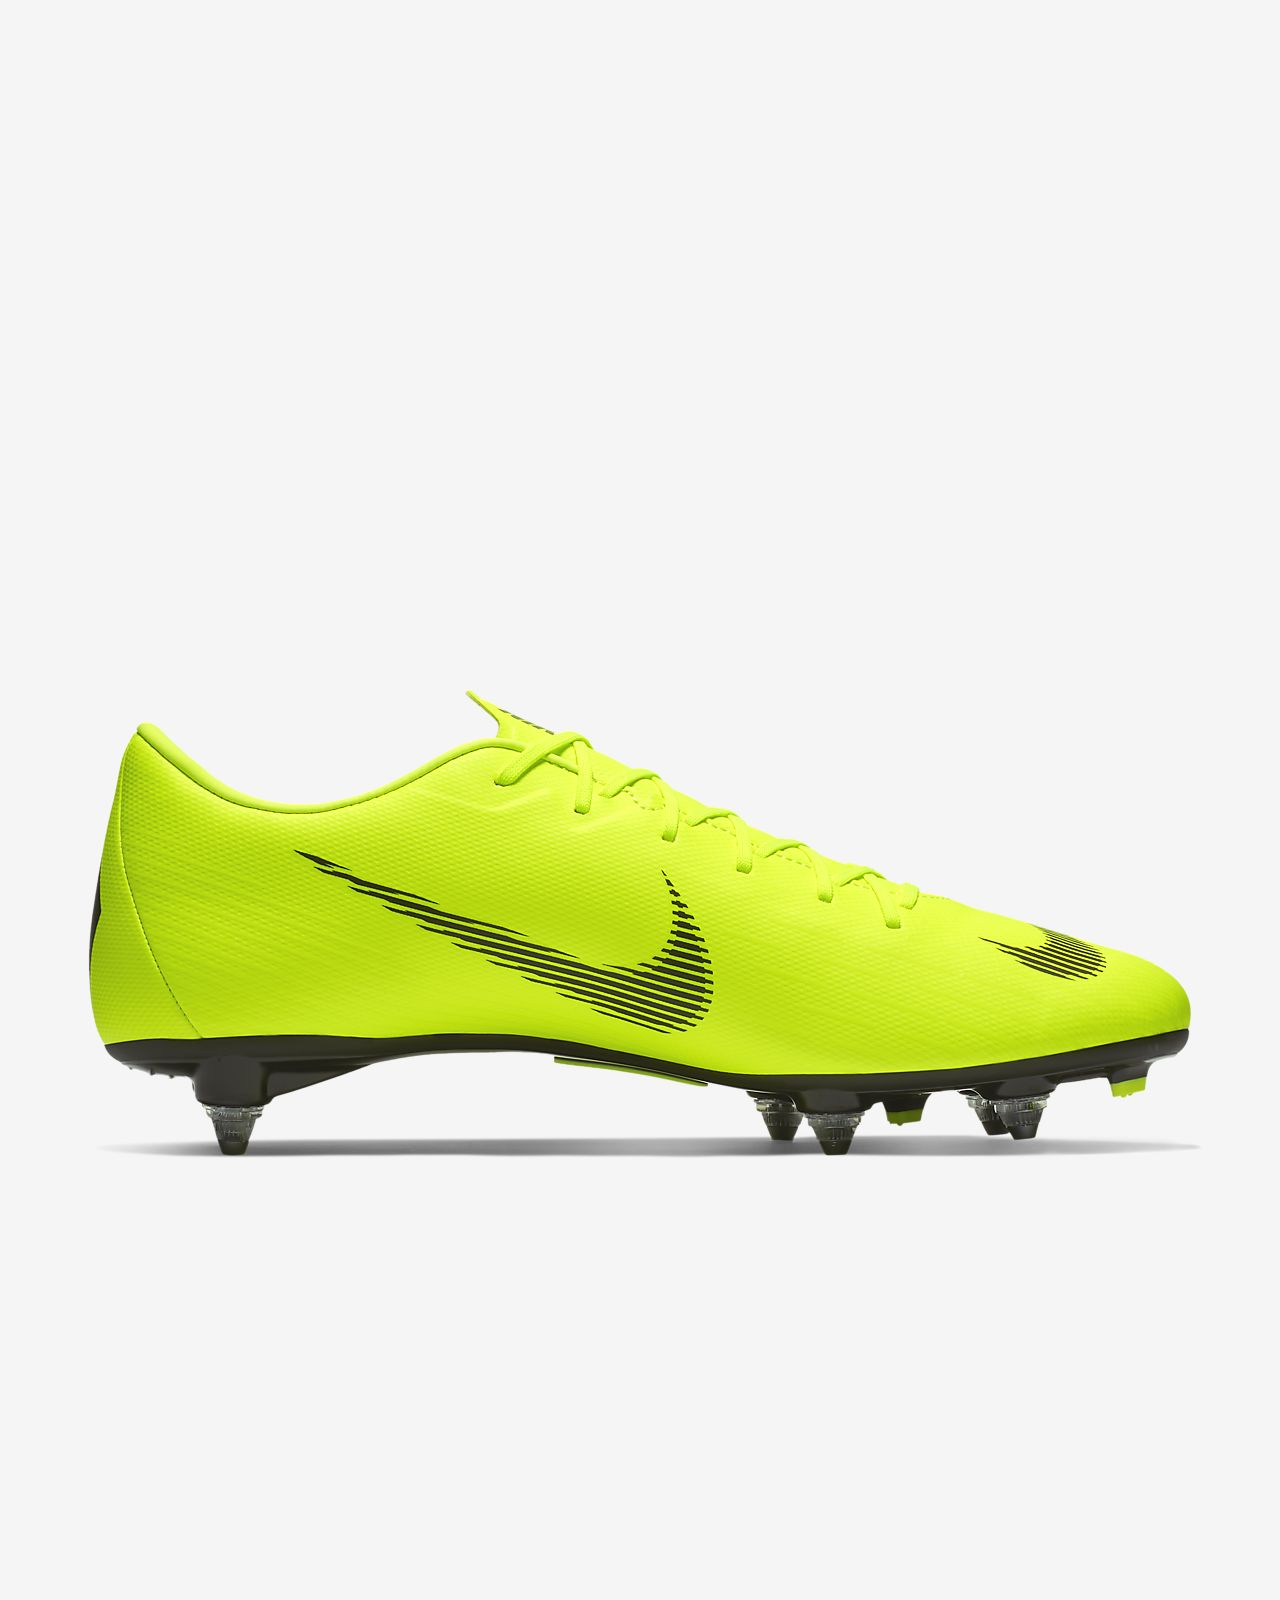 cheap for discount 315e1 d80da ... Chaussure de football à crampons pour terrain gras Nike Mercurial Vapor  XII Academy SG-PRO